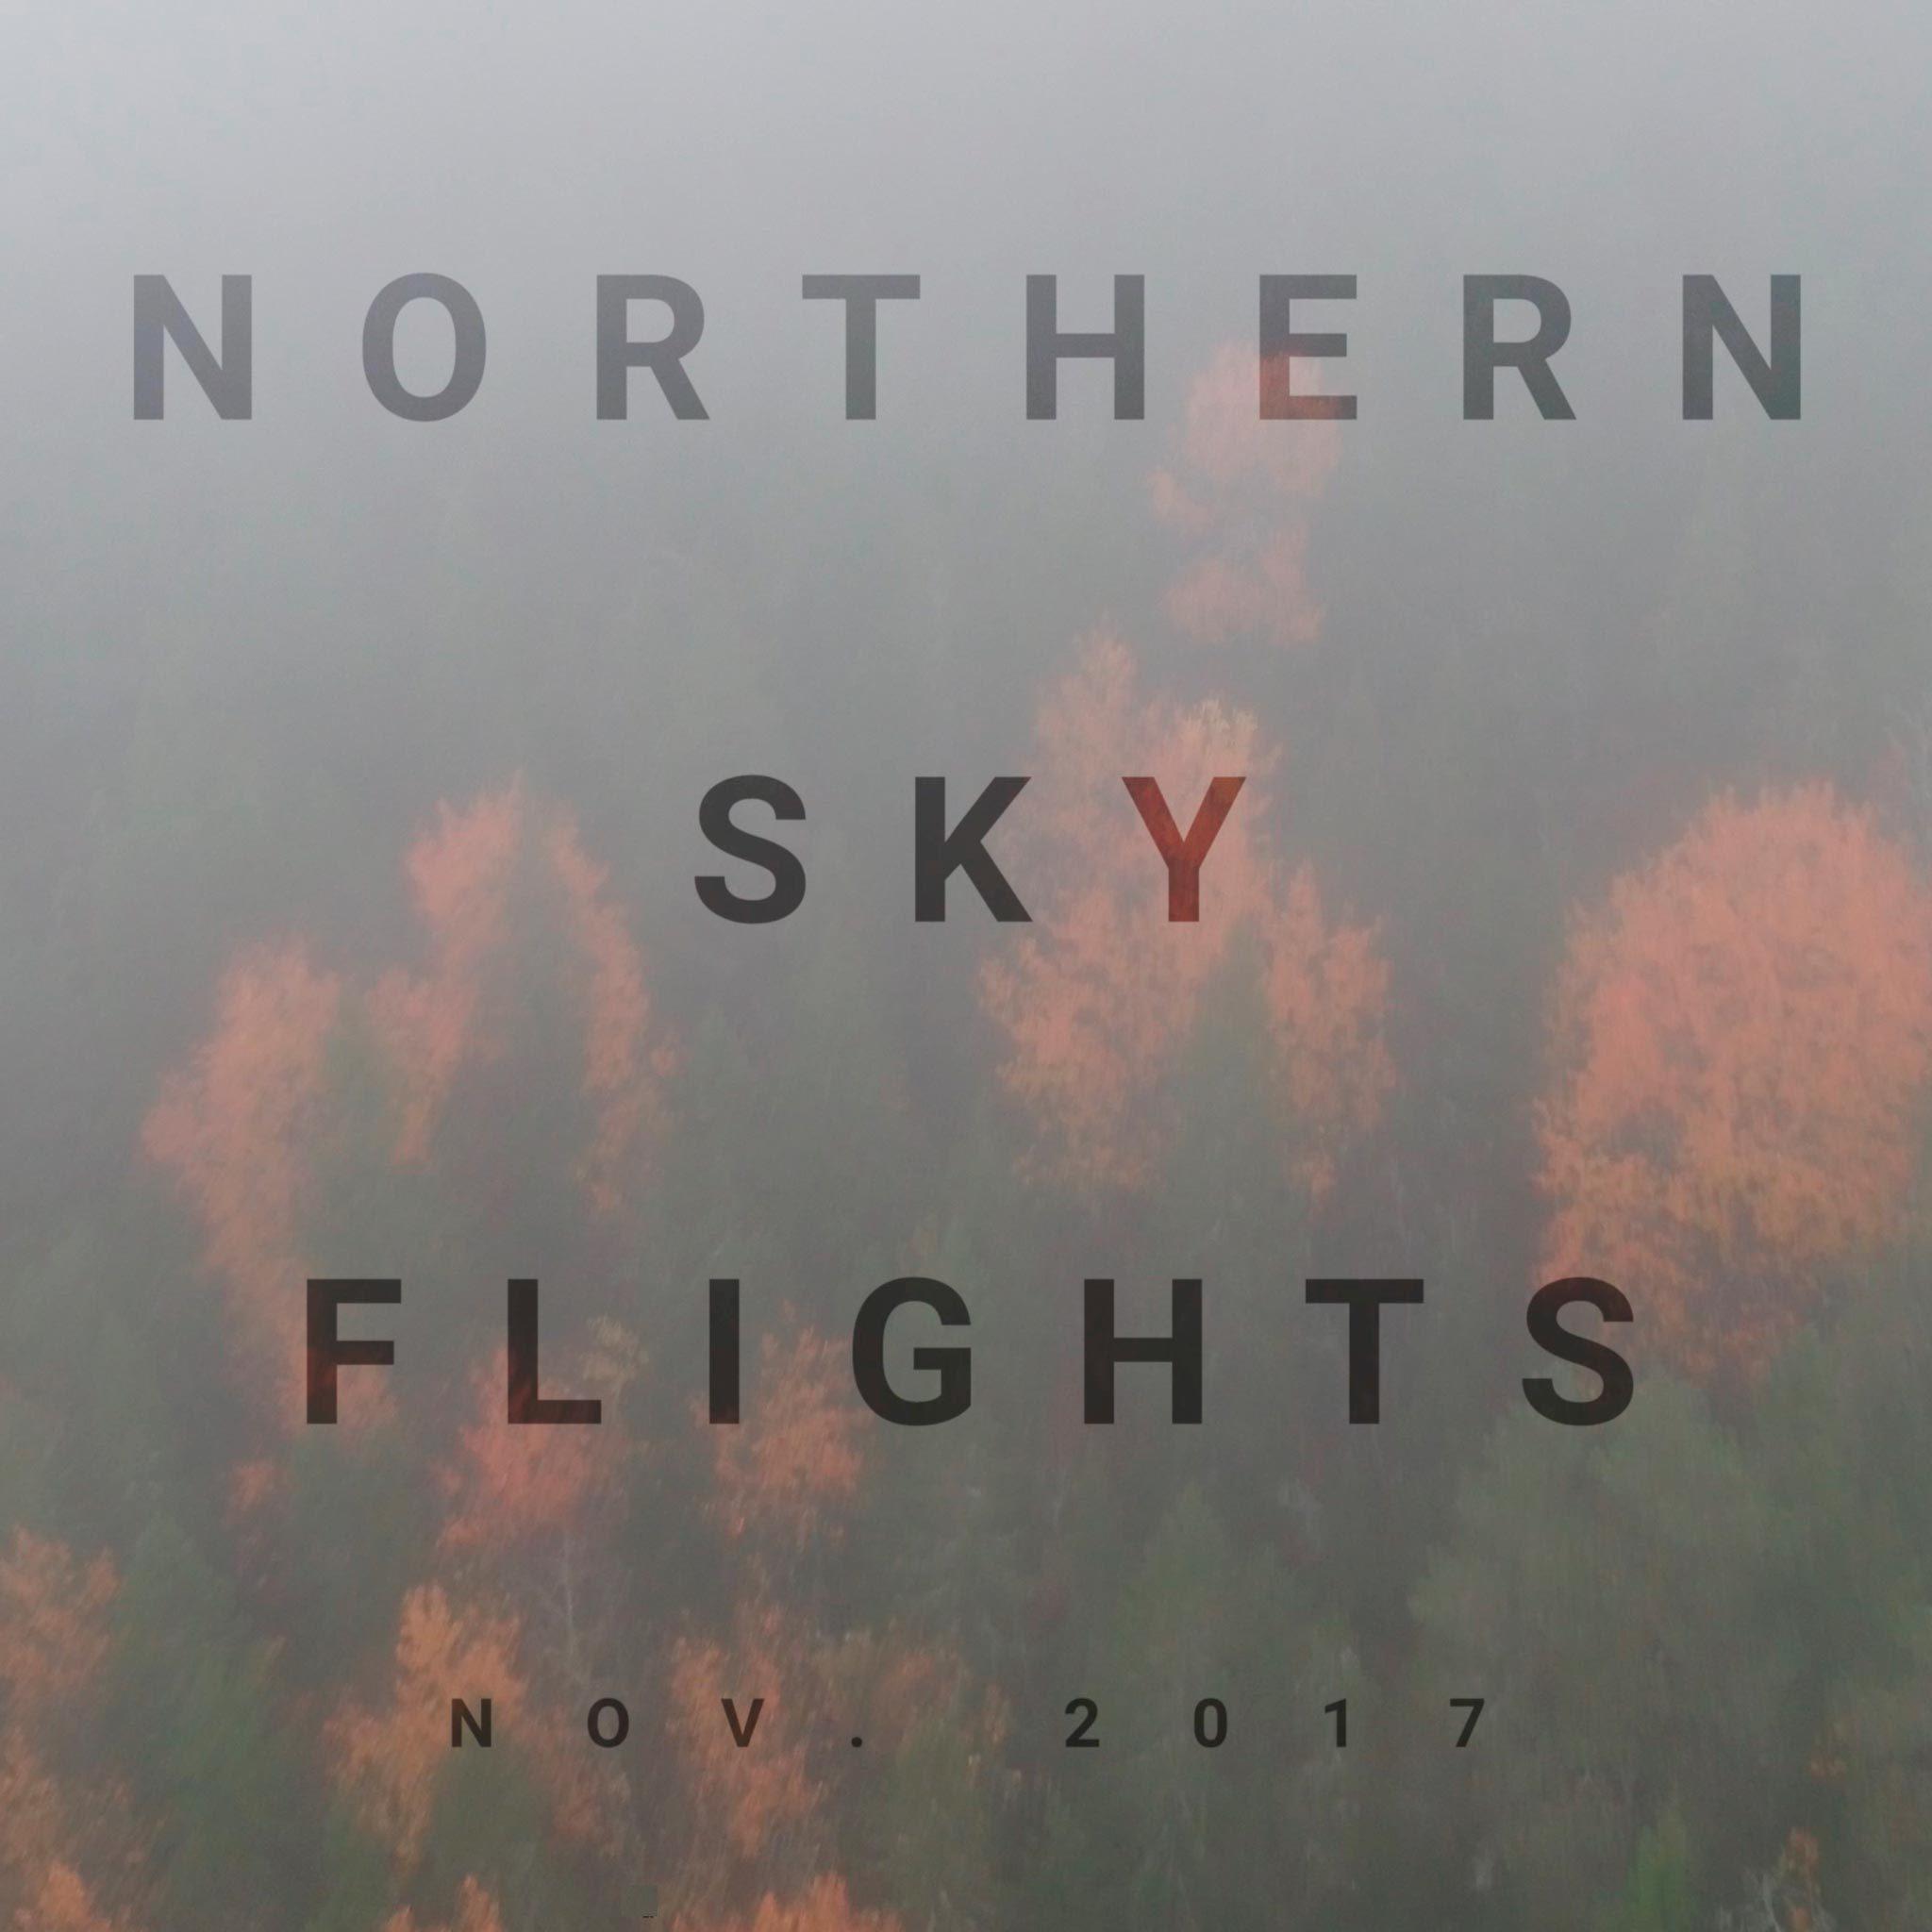 Northerm Sky Flight - DJI Inspire 2 - NOV 2017